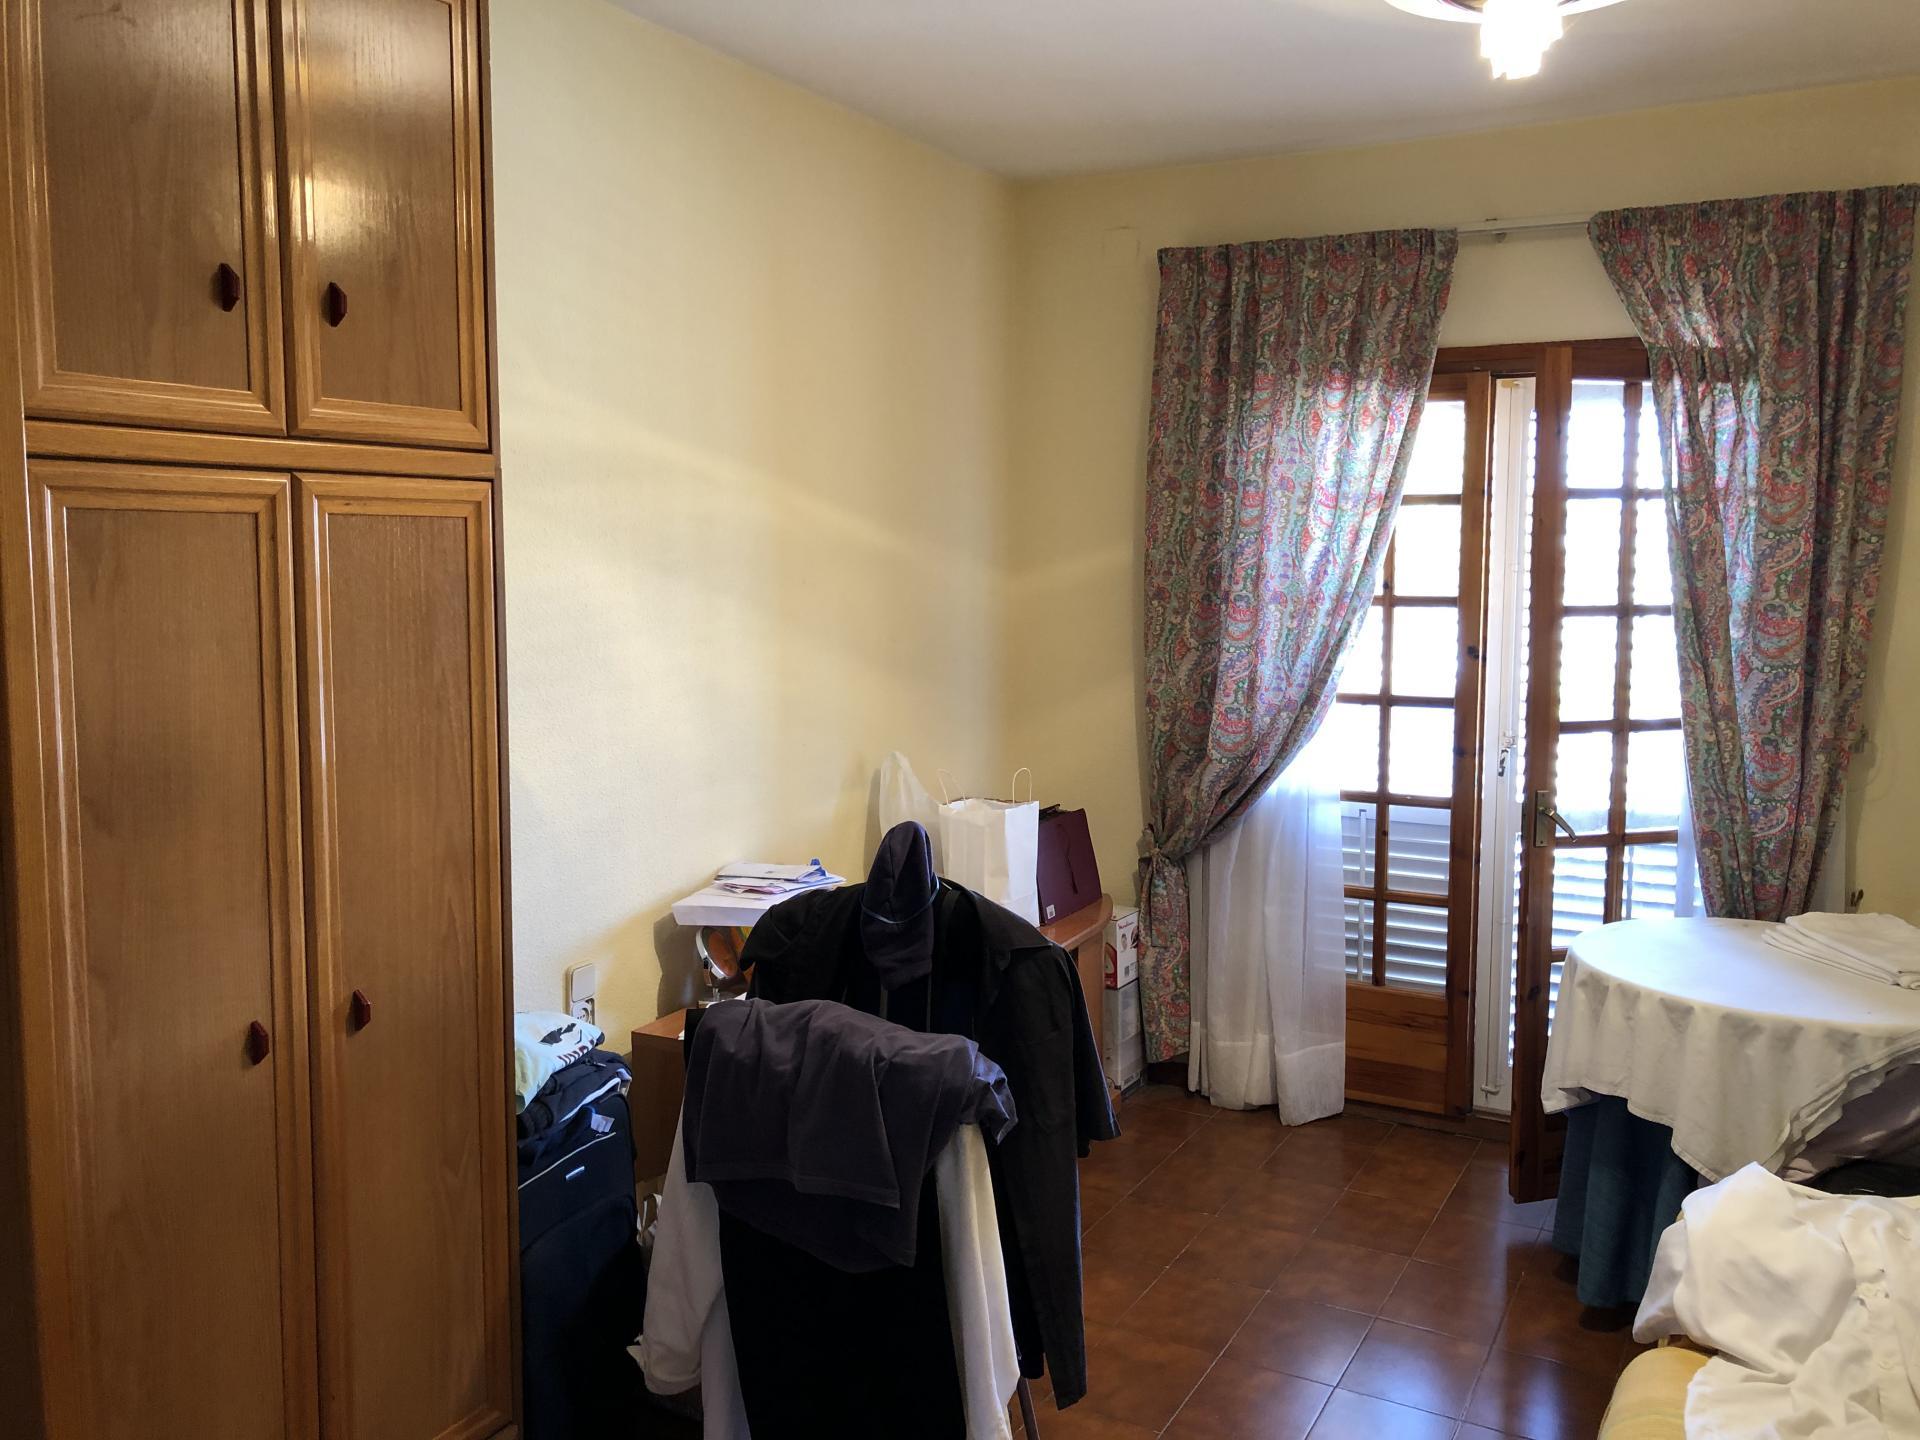 Foto 32 (V-735-2021) - Inmueble en  Venda a Santa Margarida i els Monjos